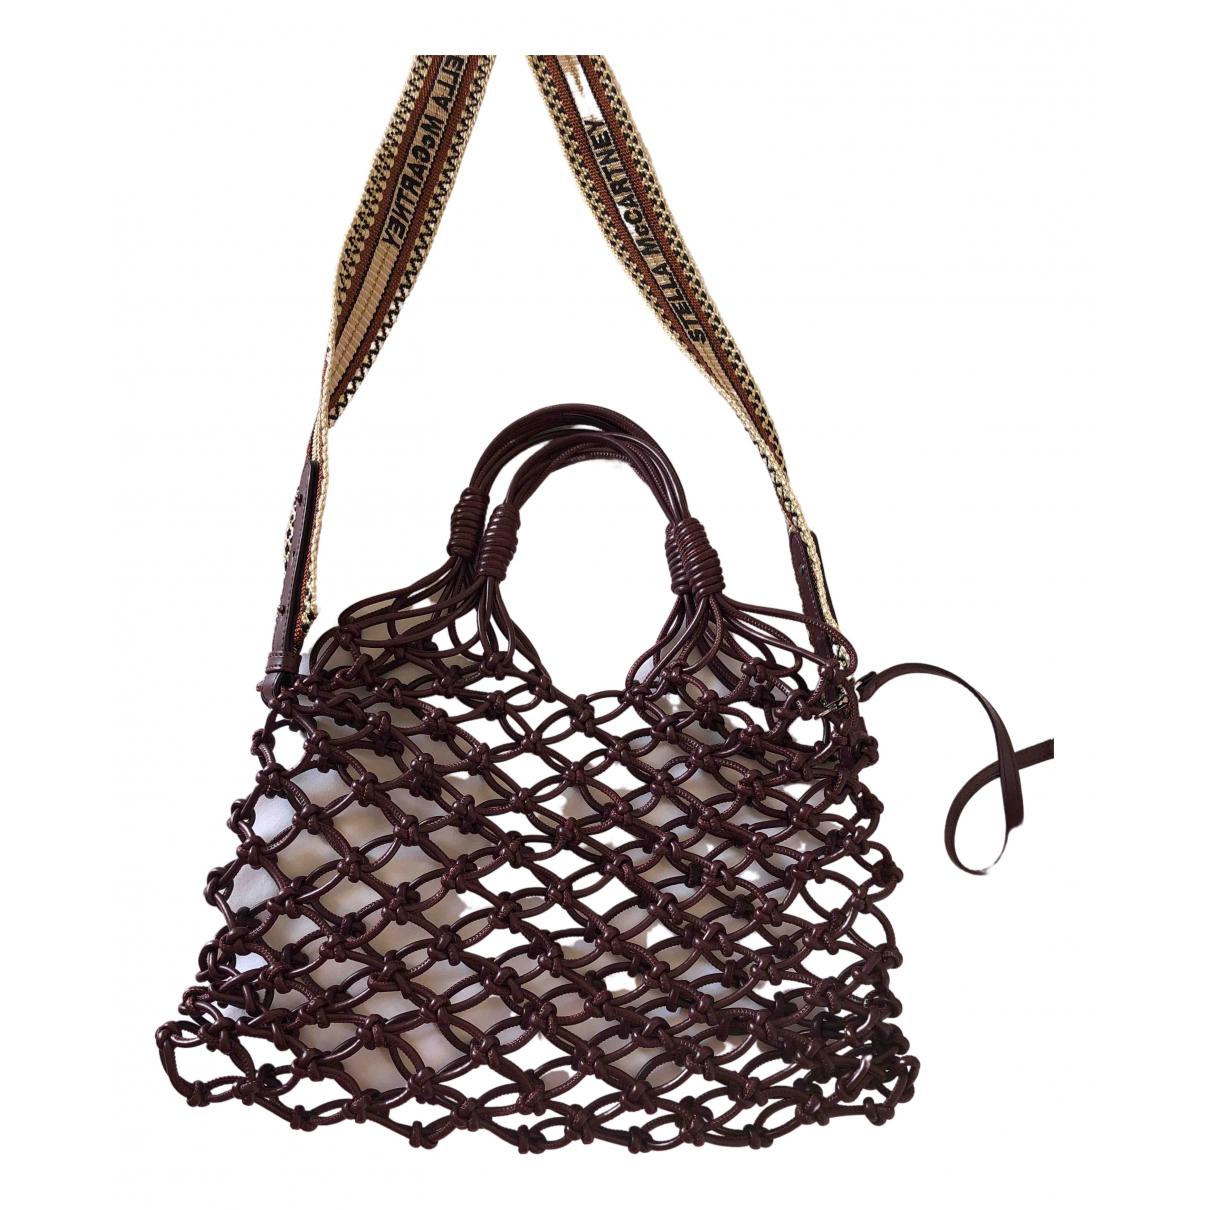 Stella Mccartney \N Burgundy handbag for Women \N